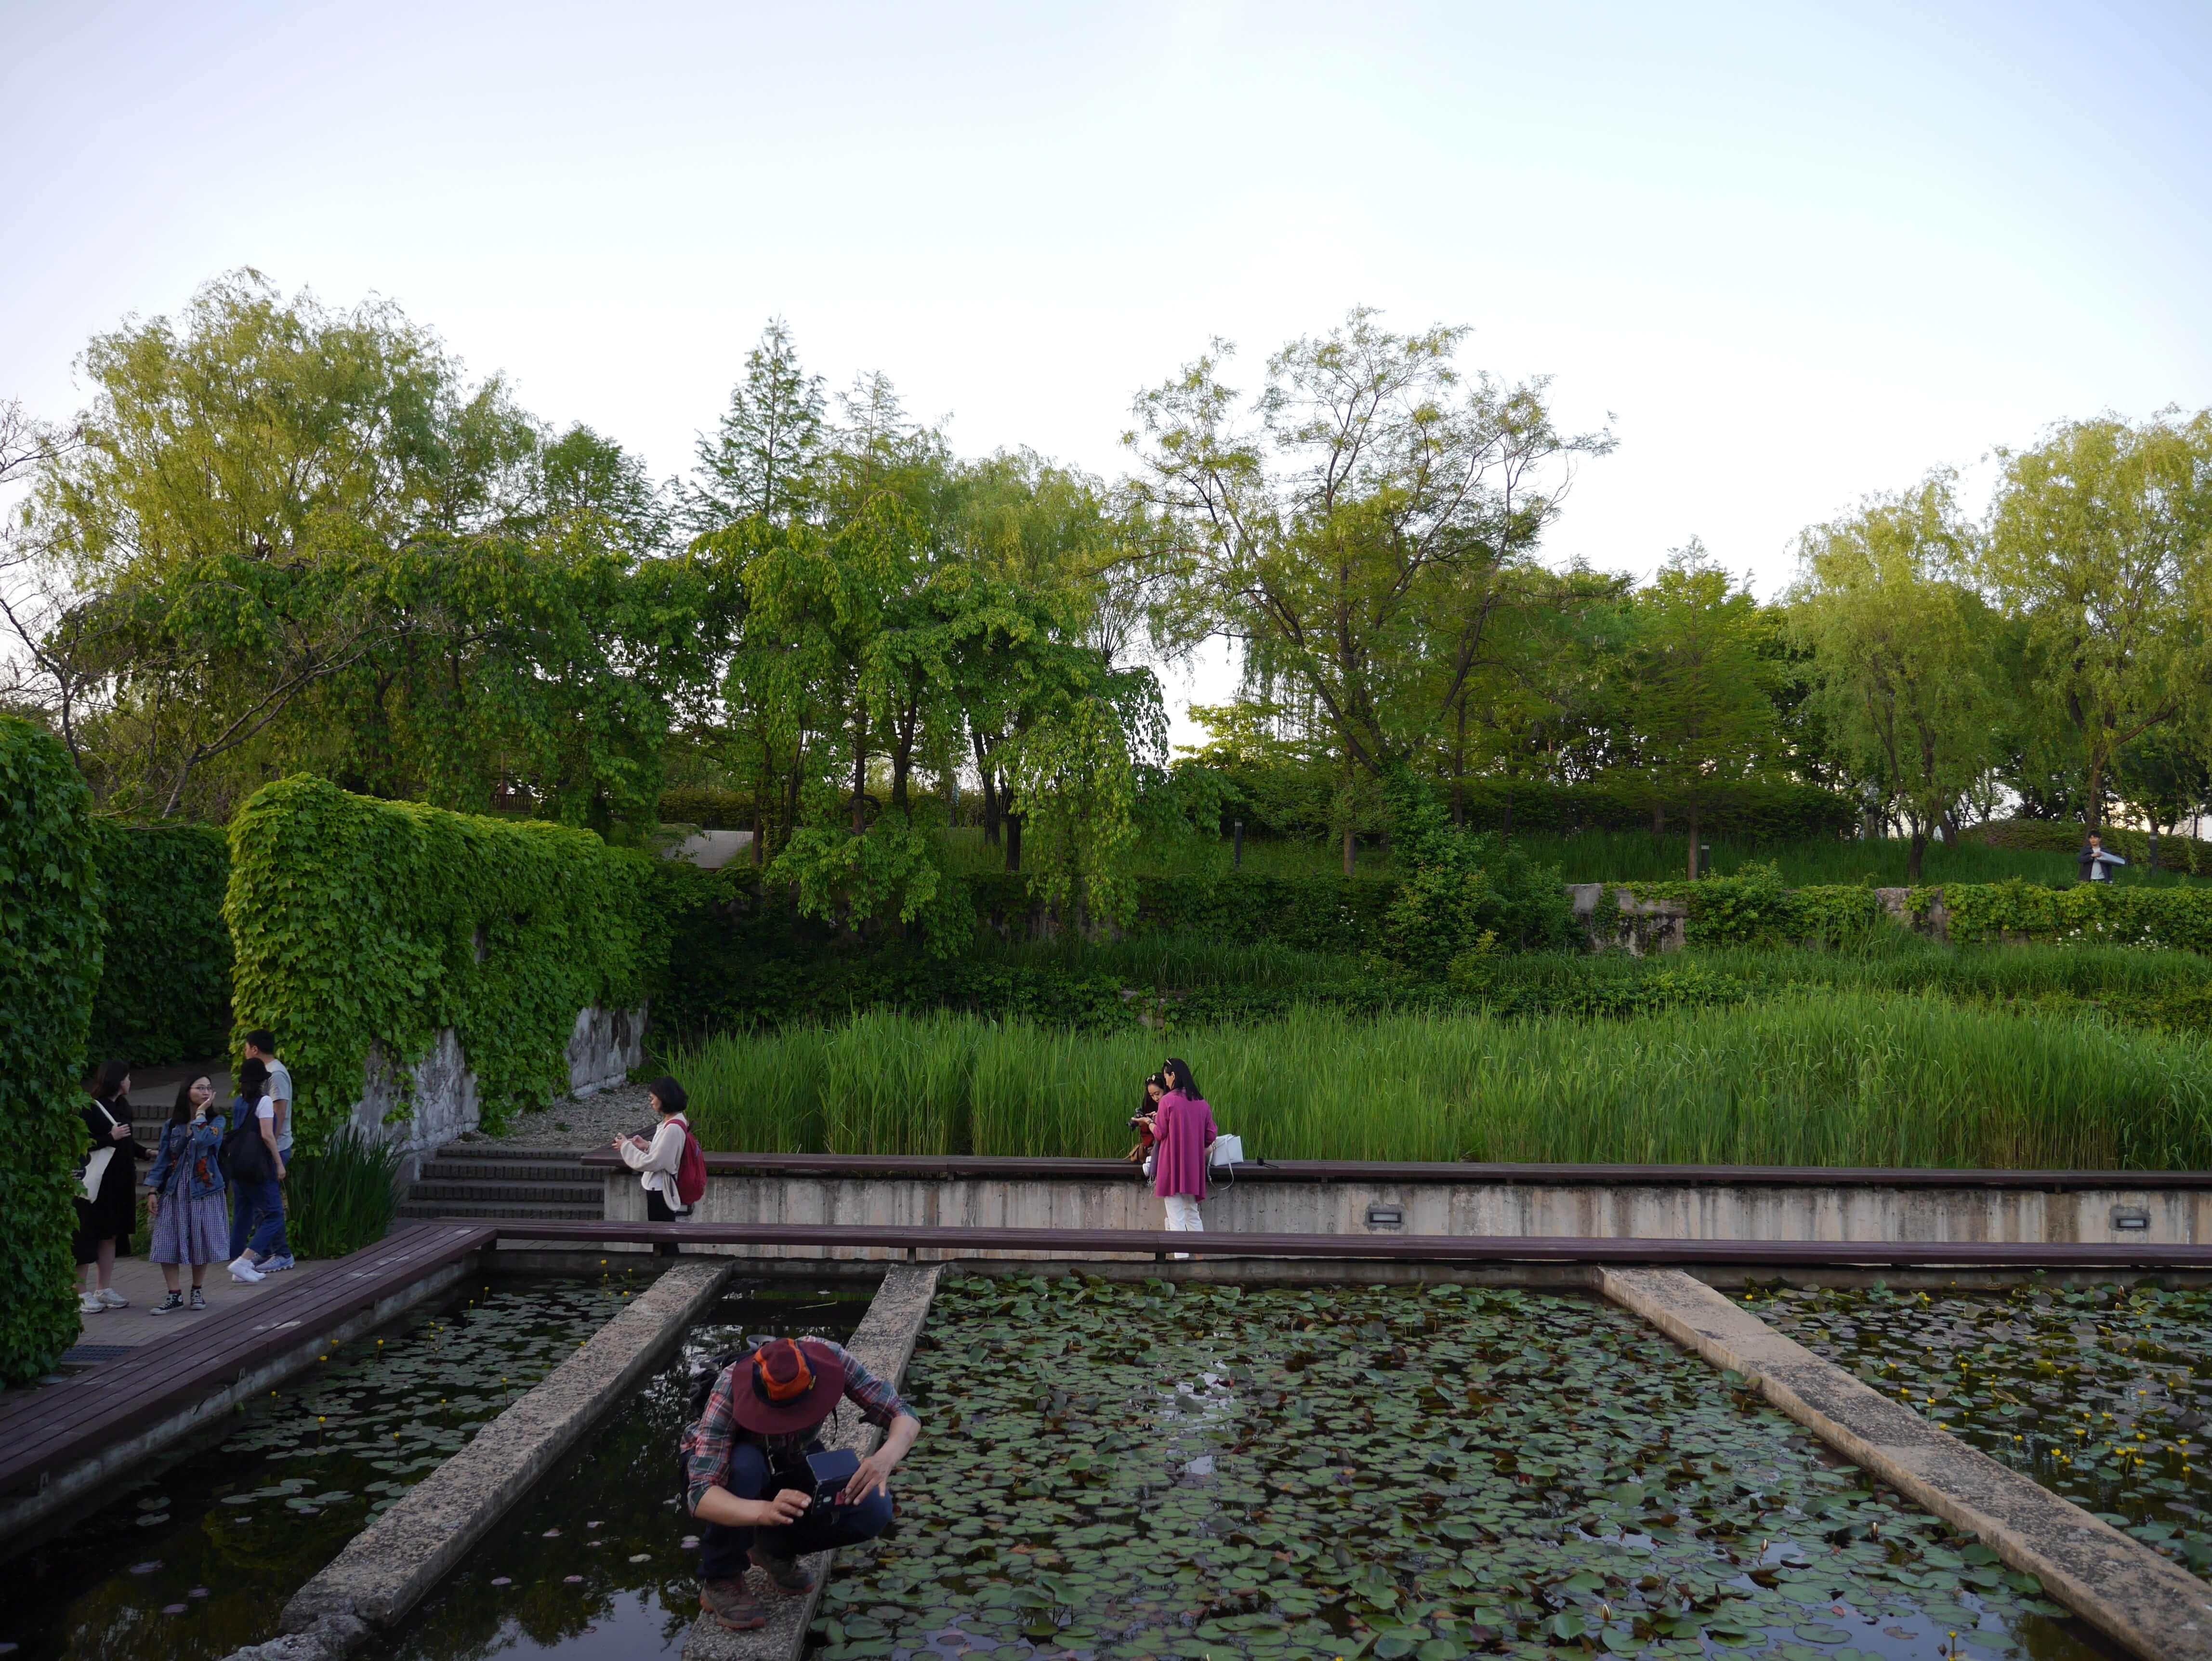 Parque-Seonyudo-Seúl-Corea-estanque-árboles